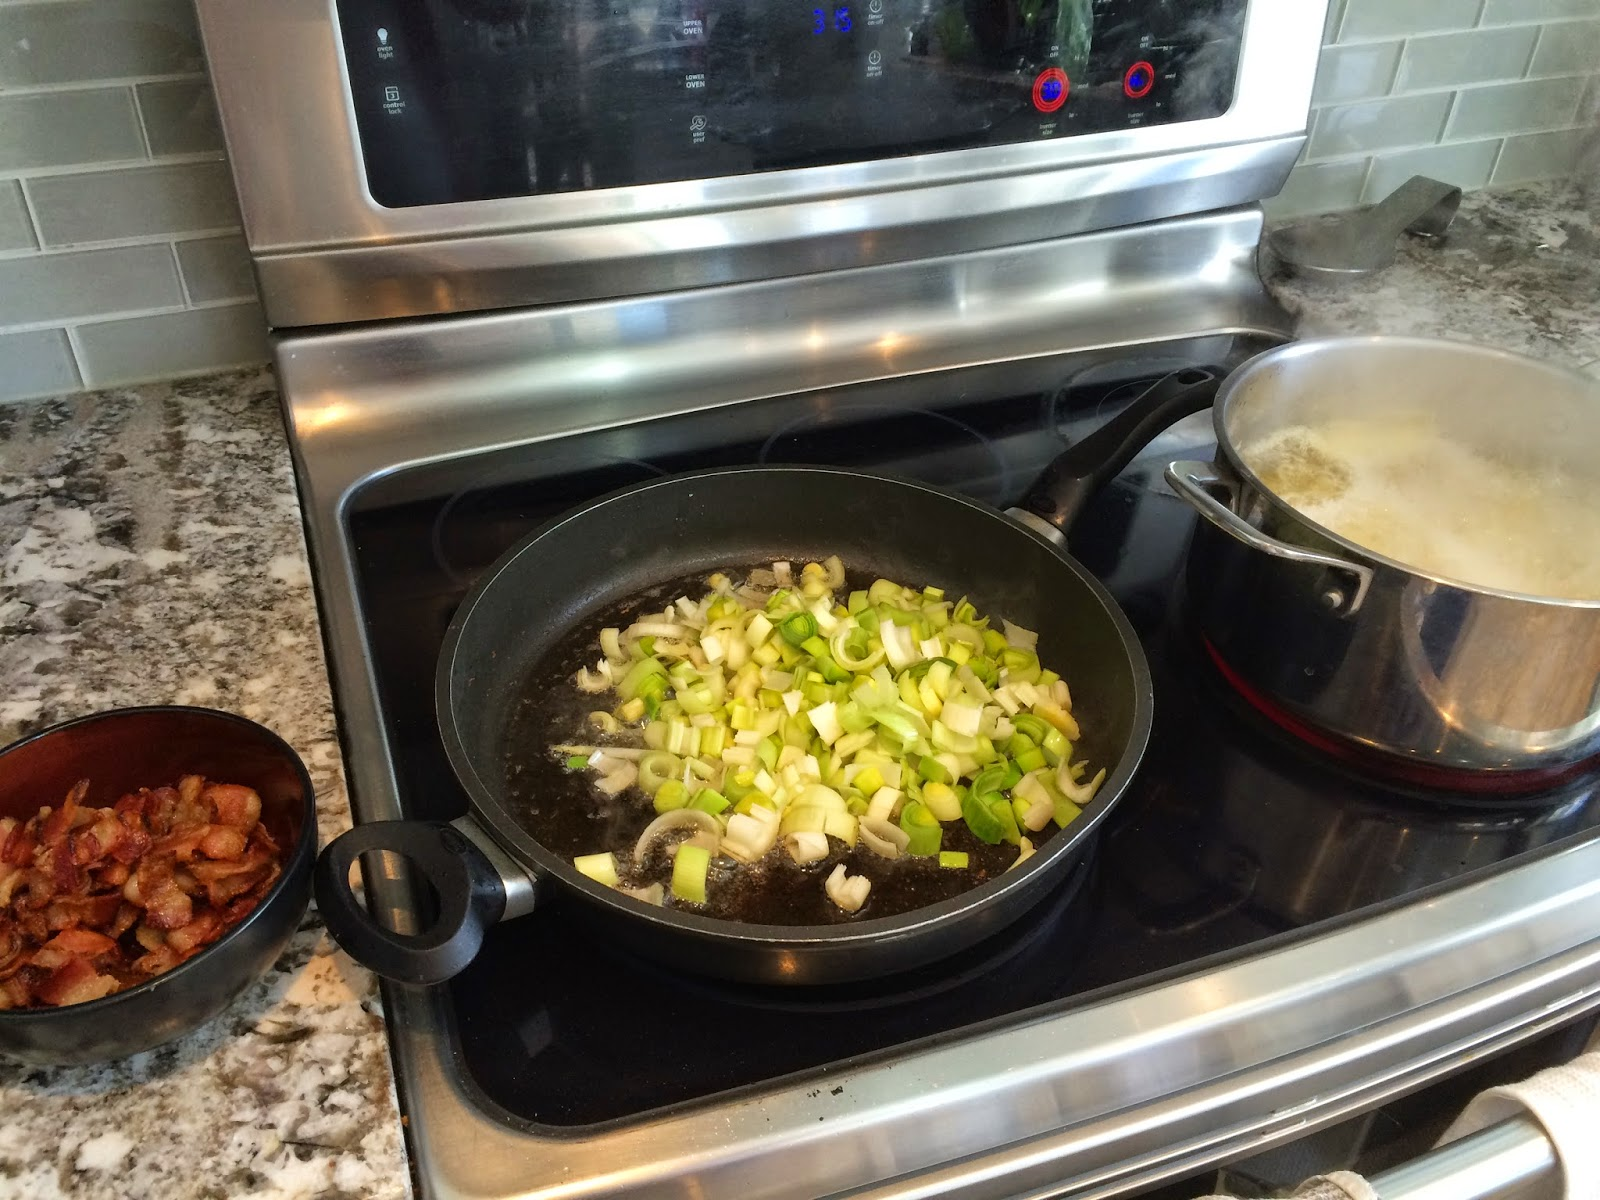 cooking Potato, Leek and Bacon Soup